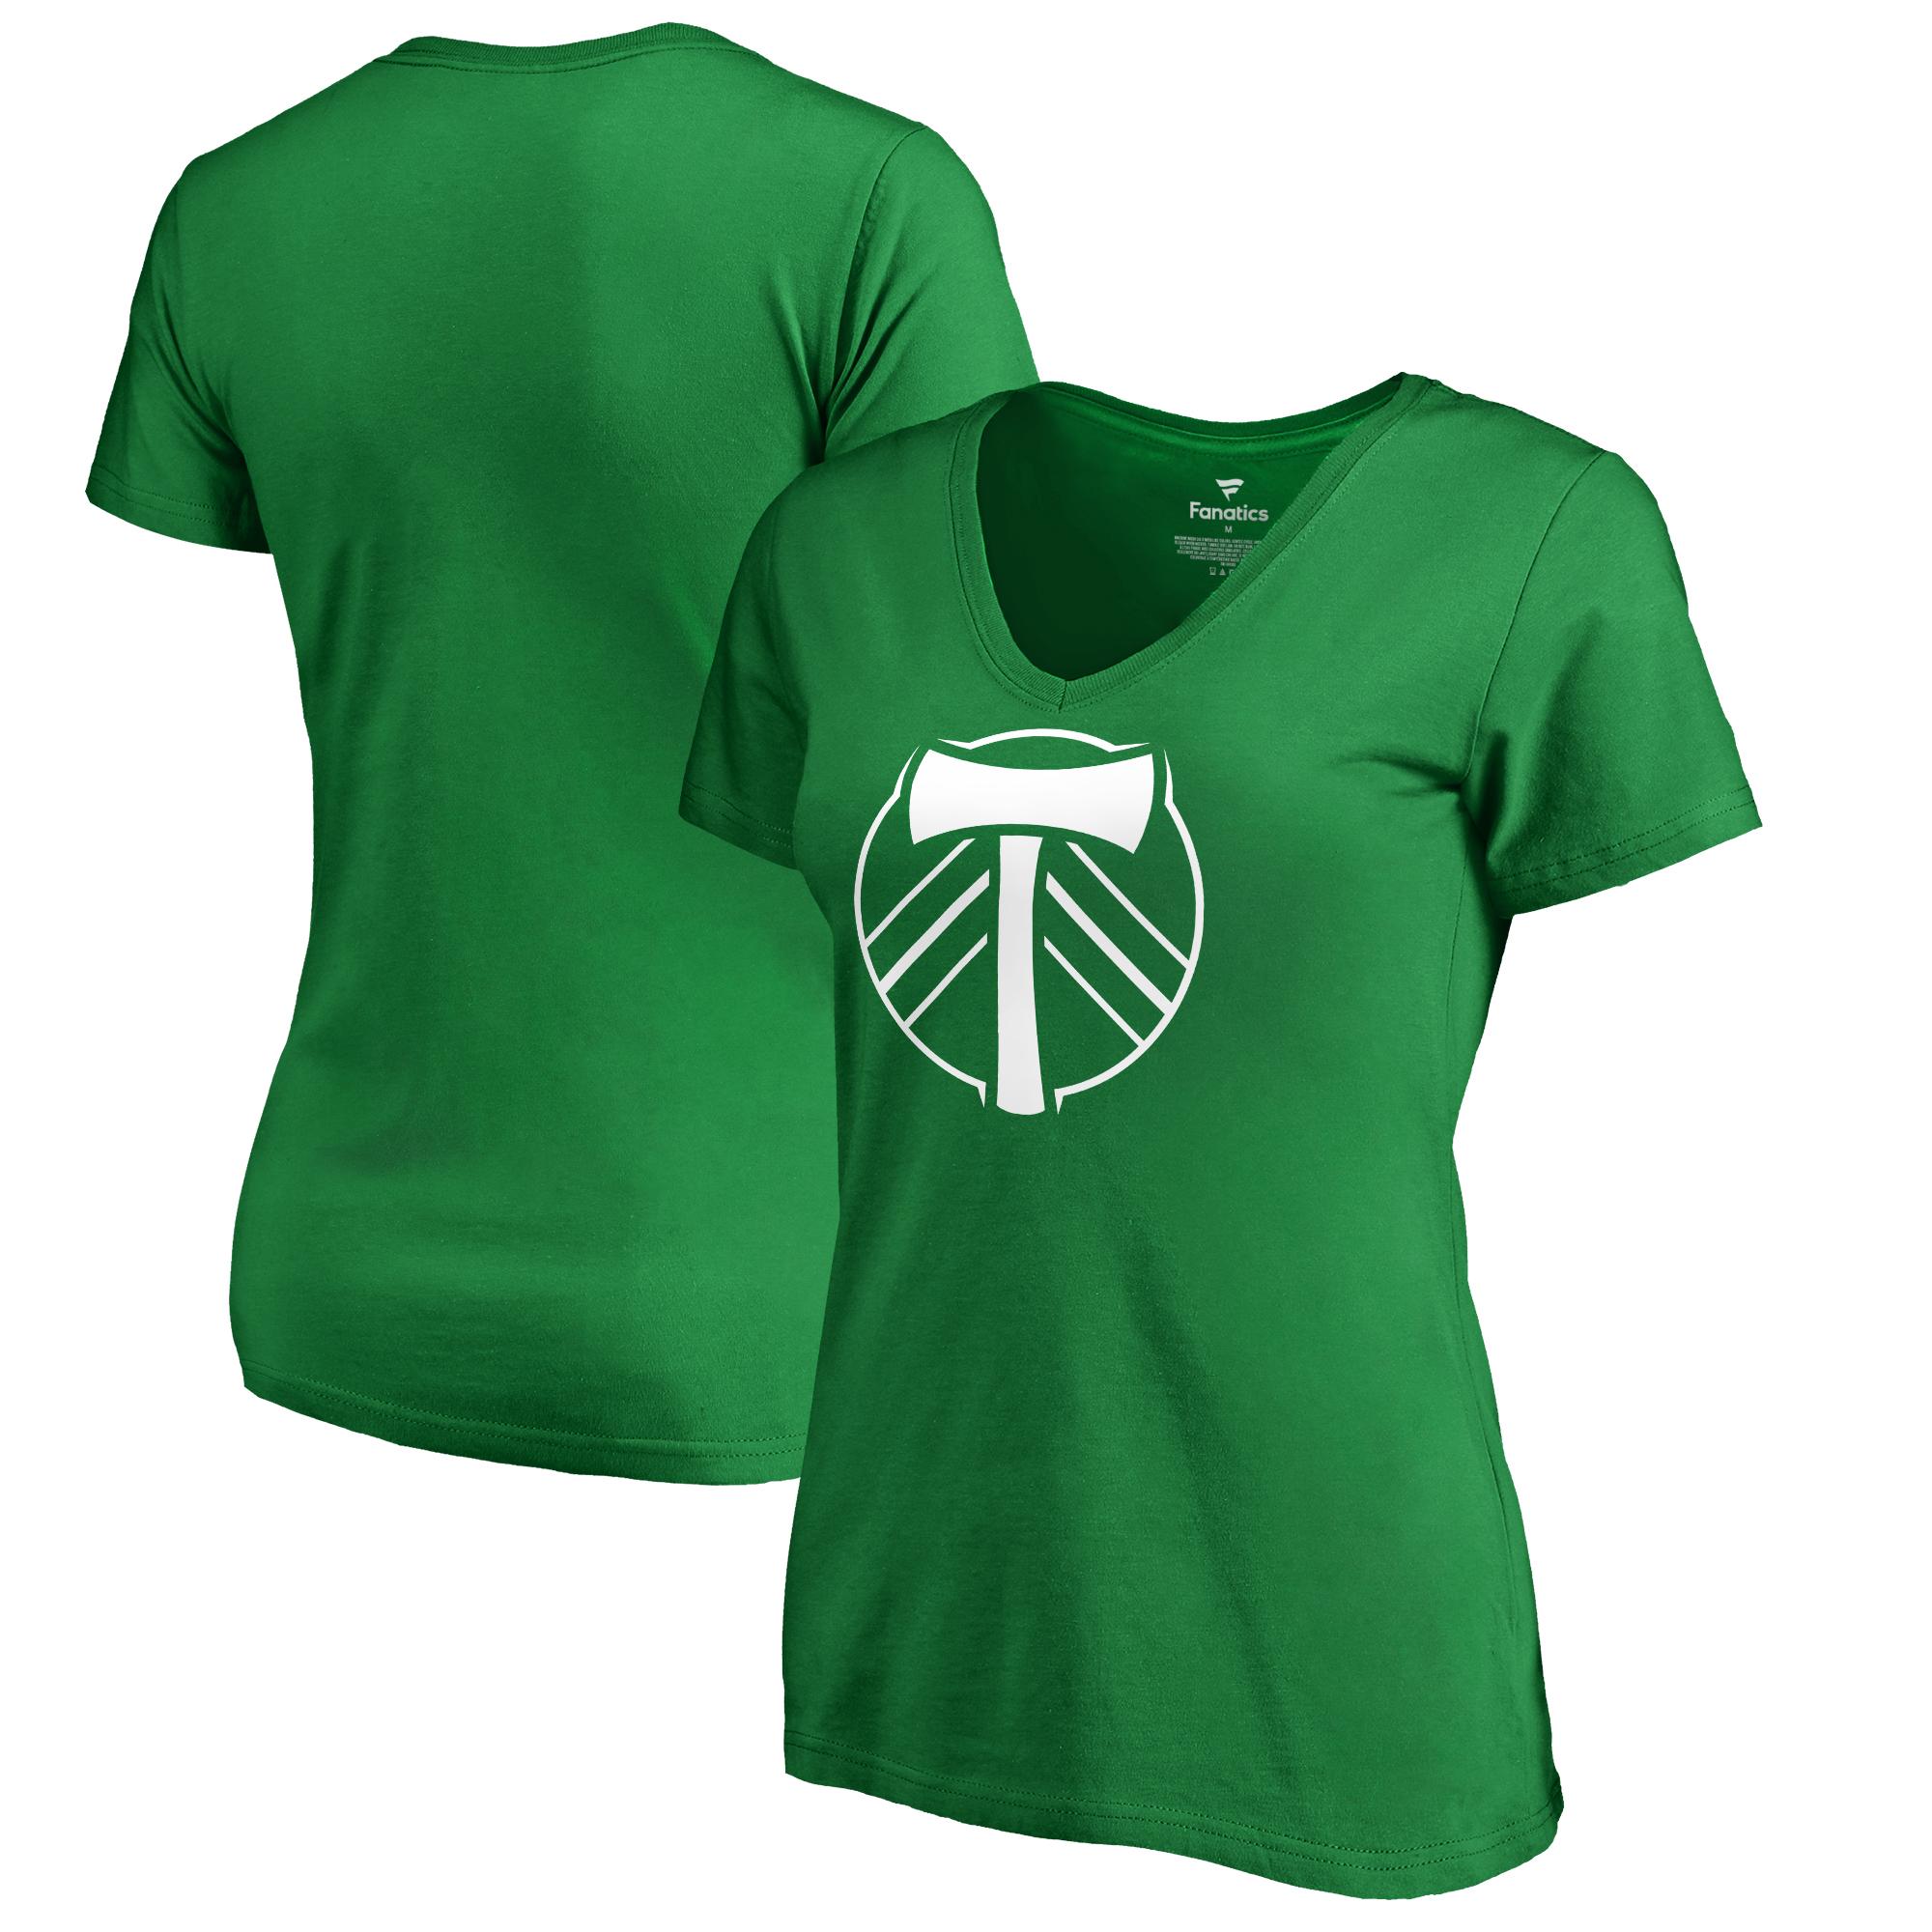 Portland Timbers Fanatics Branded Women's St. Patrick's Day White Logo V-Neck T-Shirt - Kelly Green